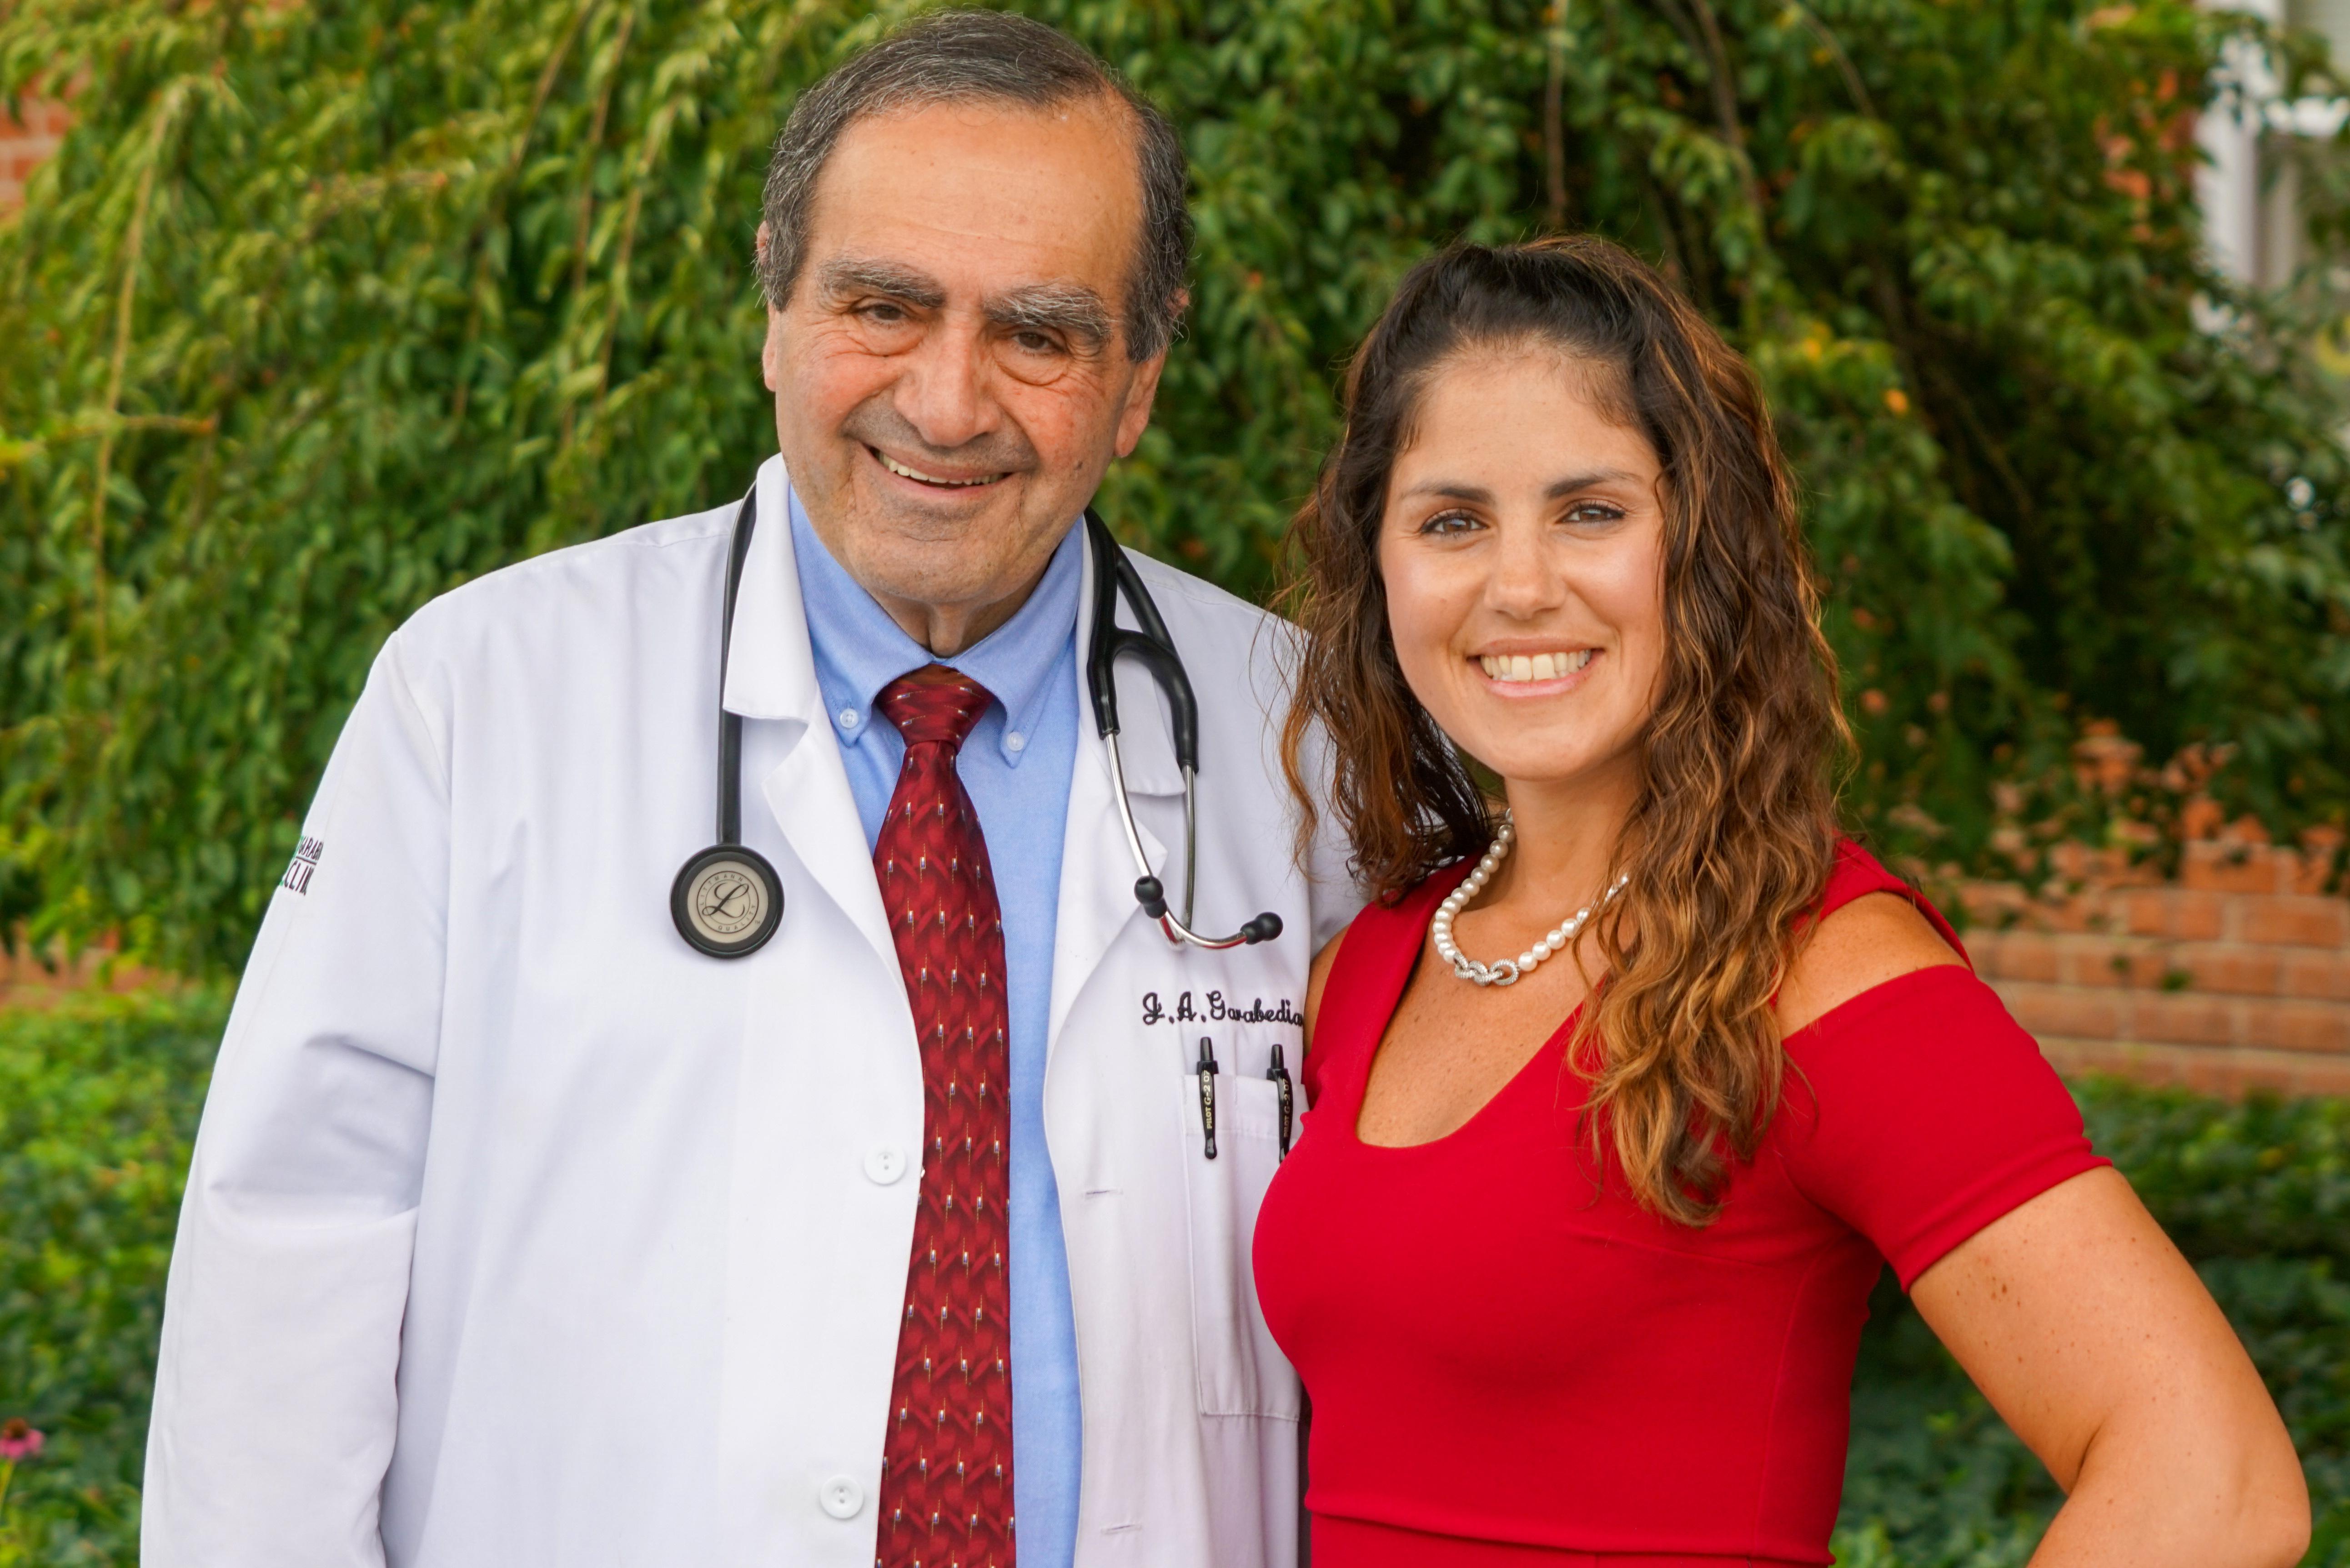 Dr. Joseph Garabedian